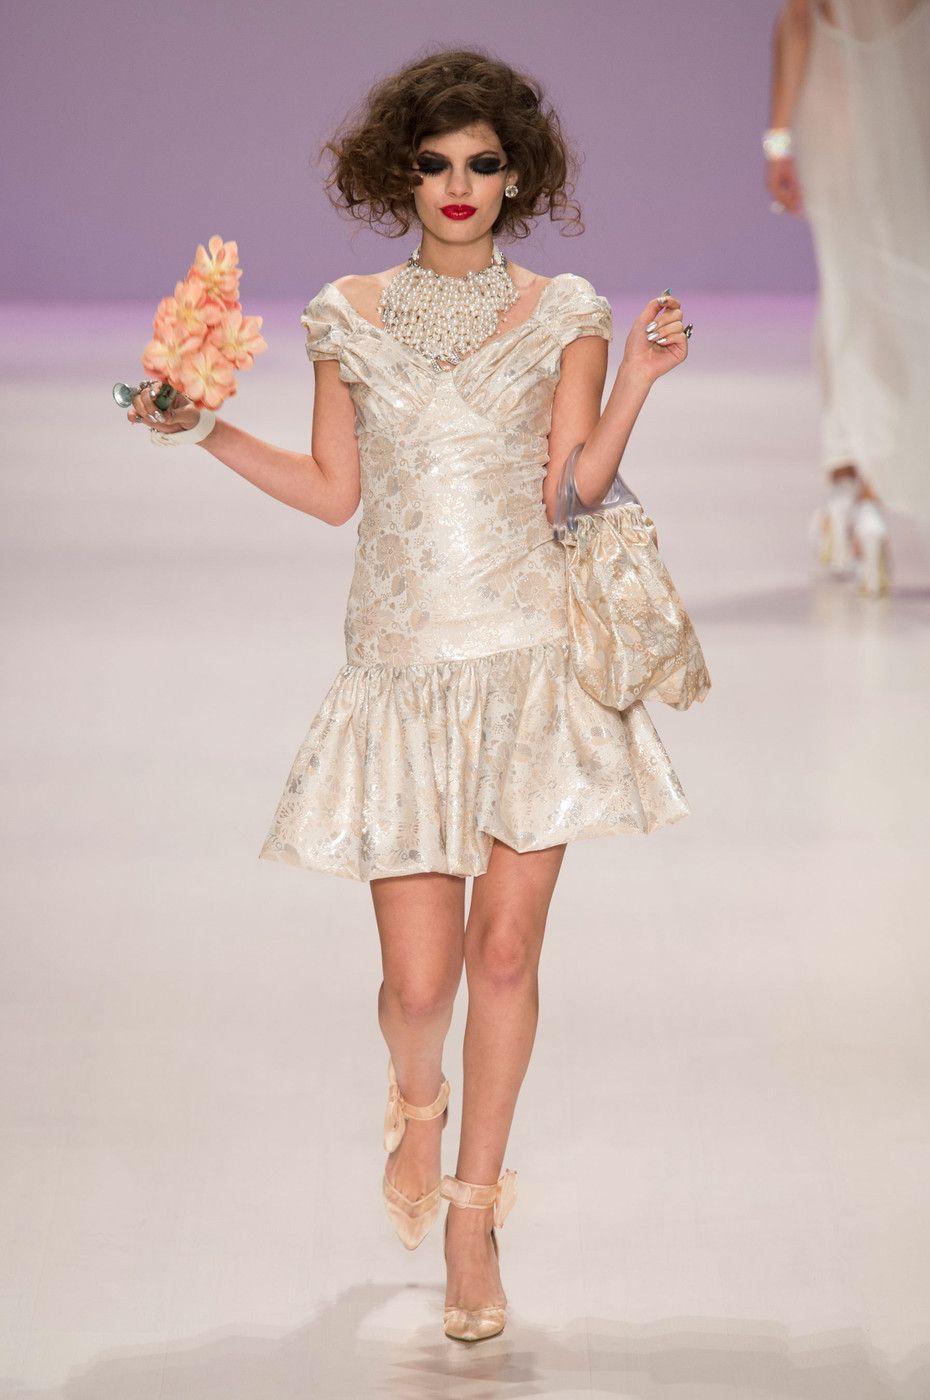 Betsey johnson wedding dresses  Betsey Johnson at New York Fashion Week Spring   Betsey johnson